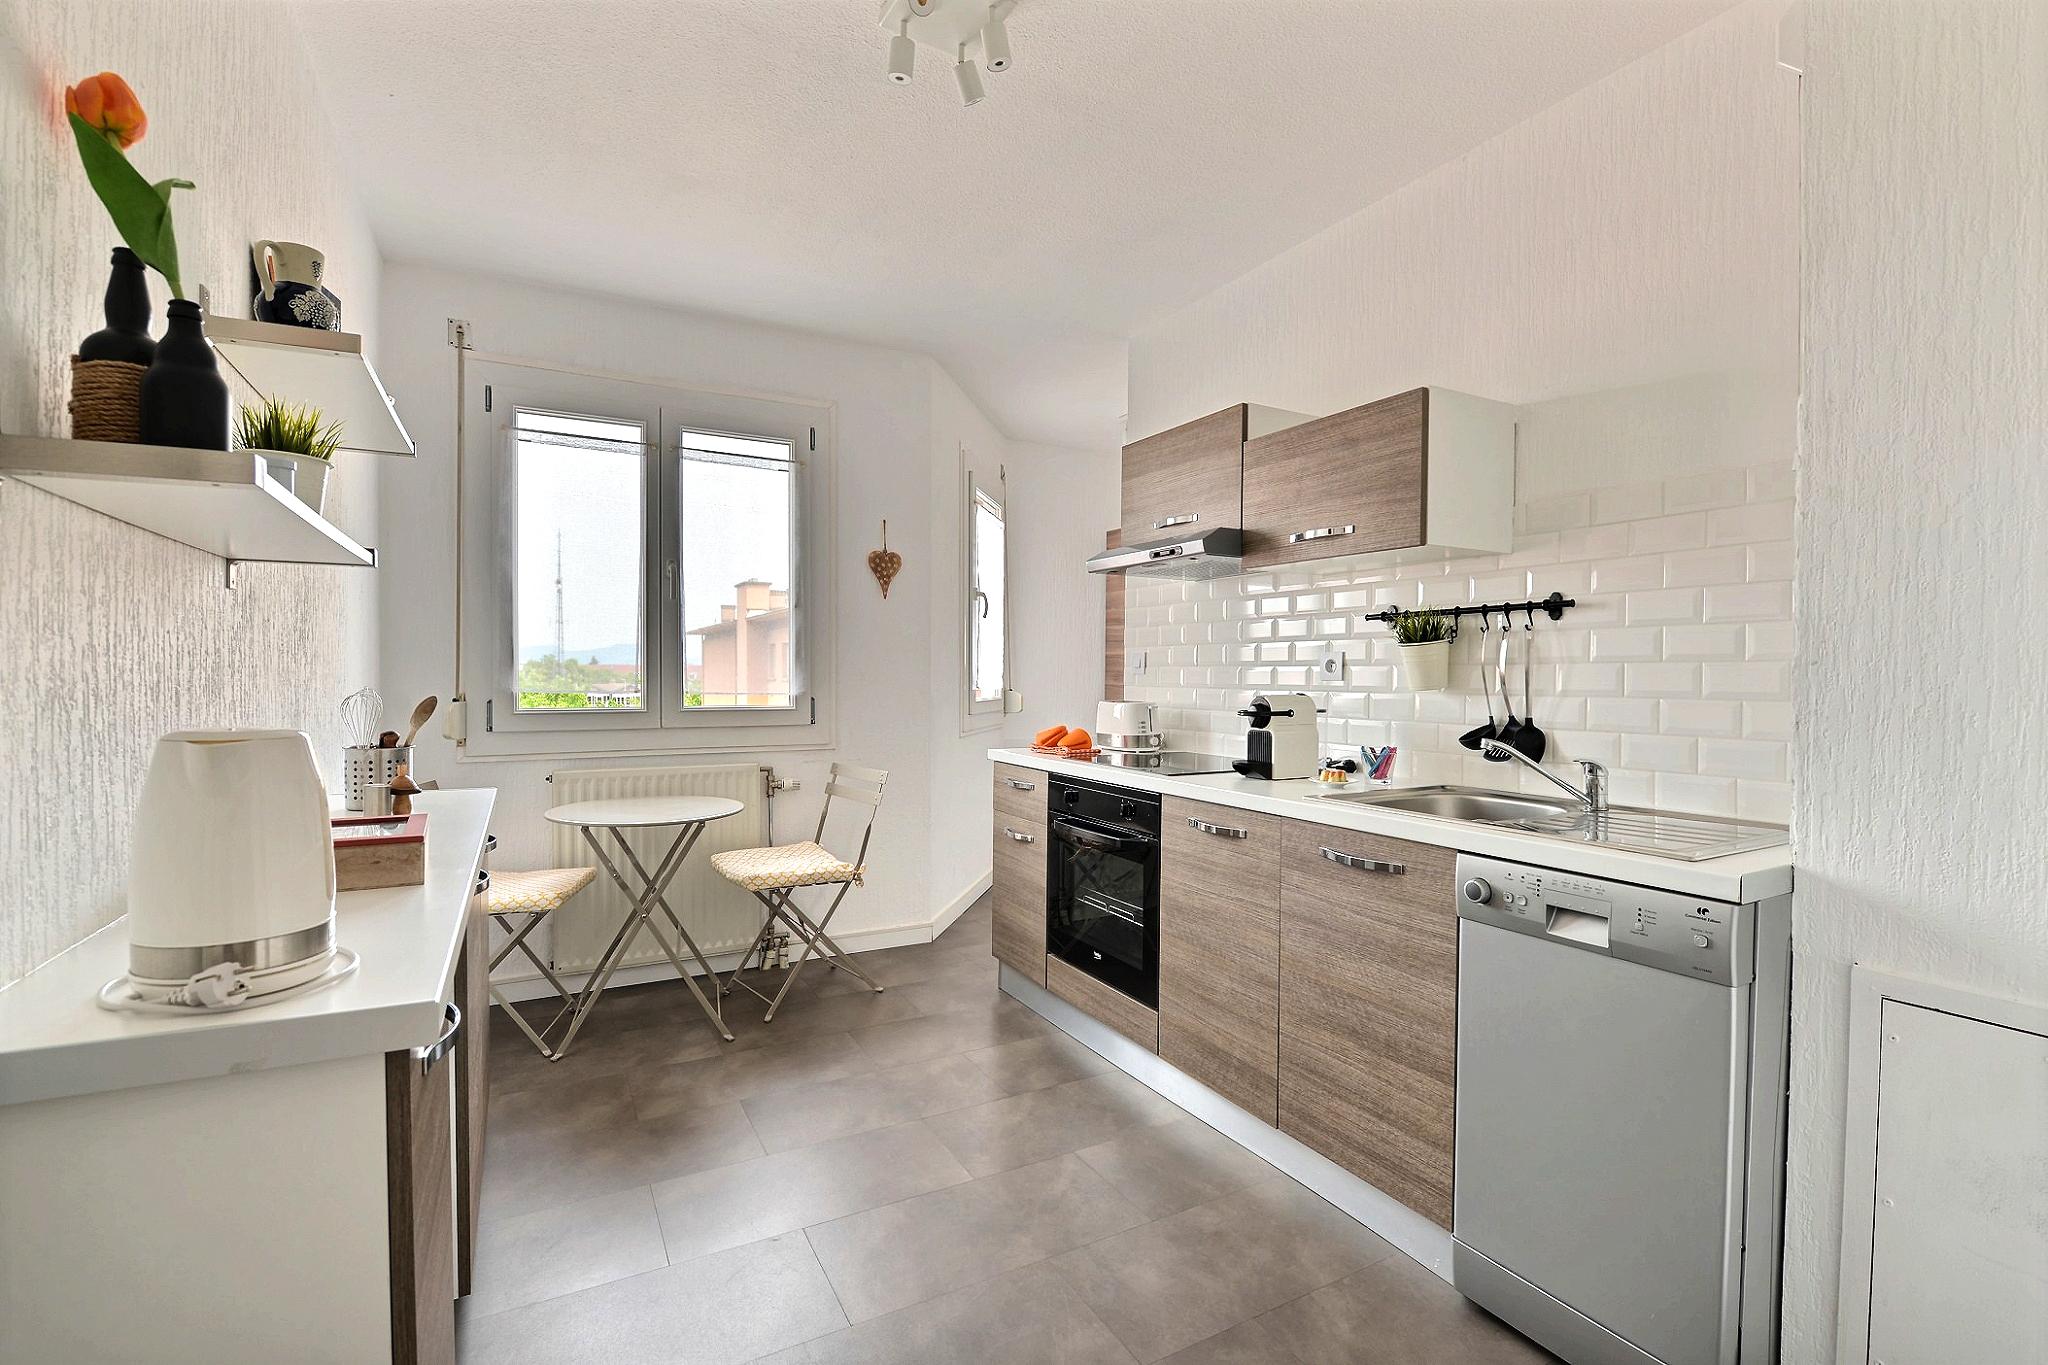 Airbnb à Colmar Haut-Rhin